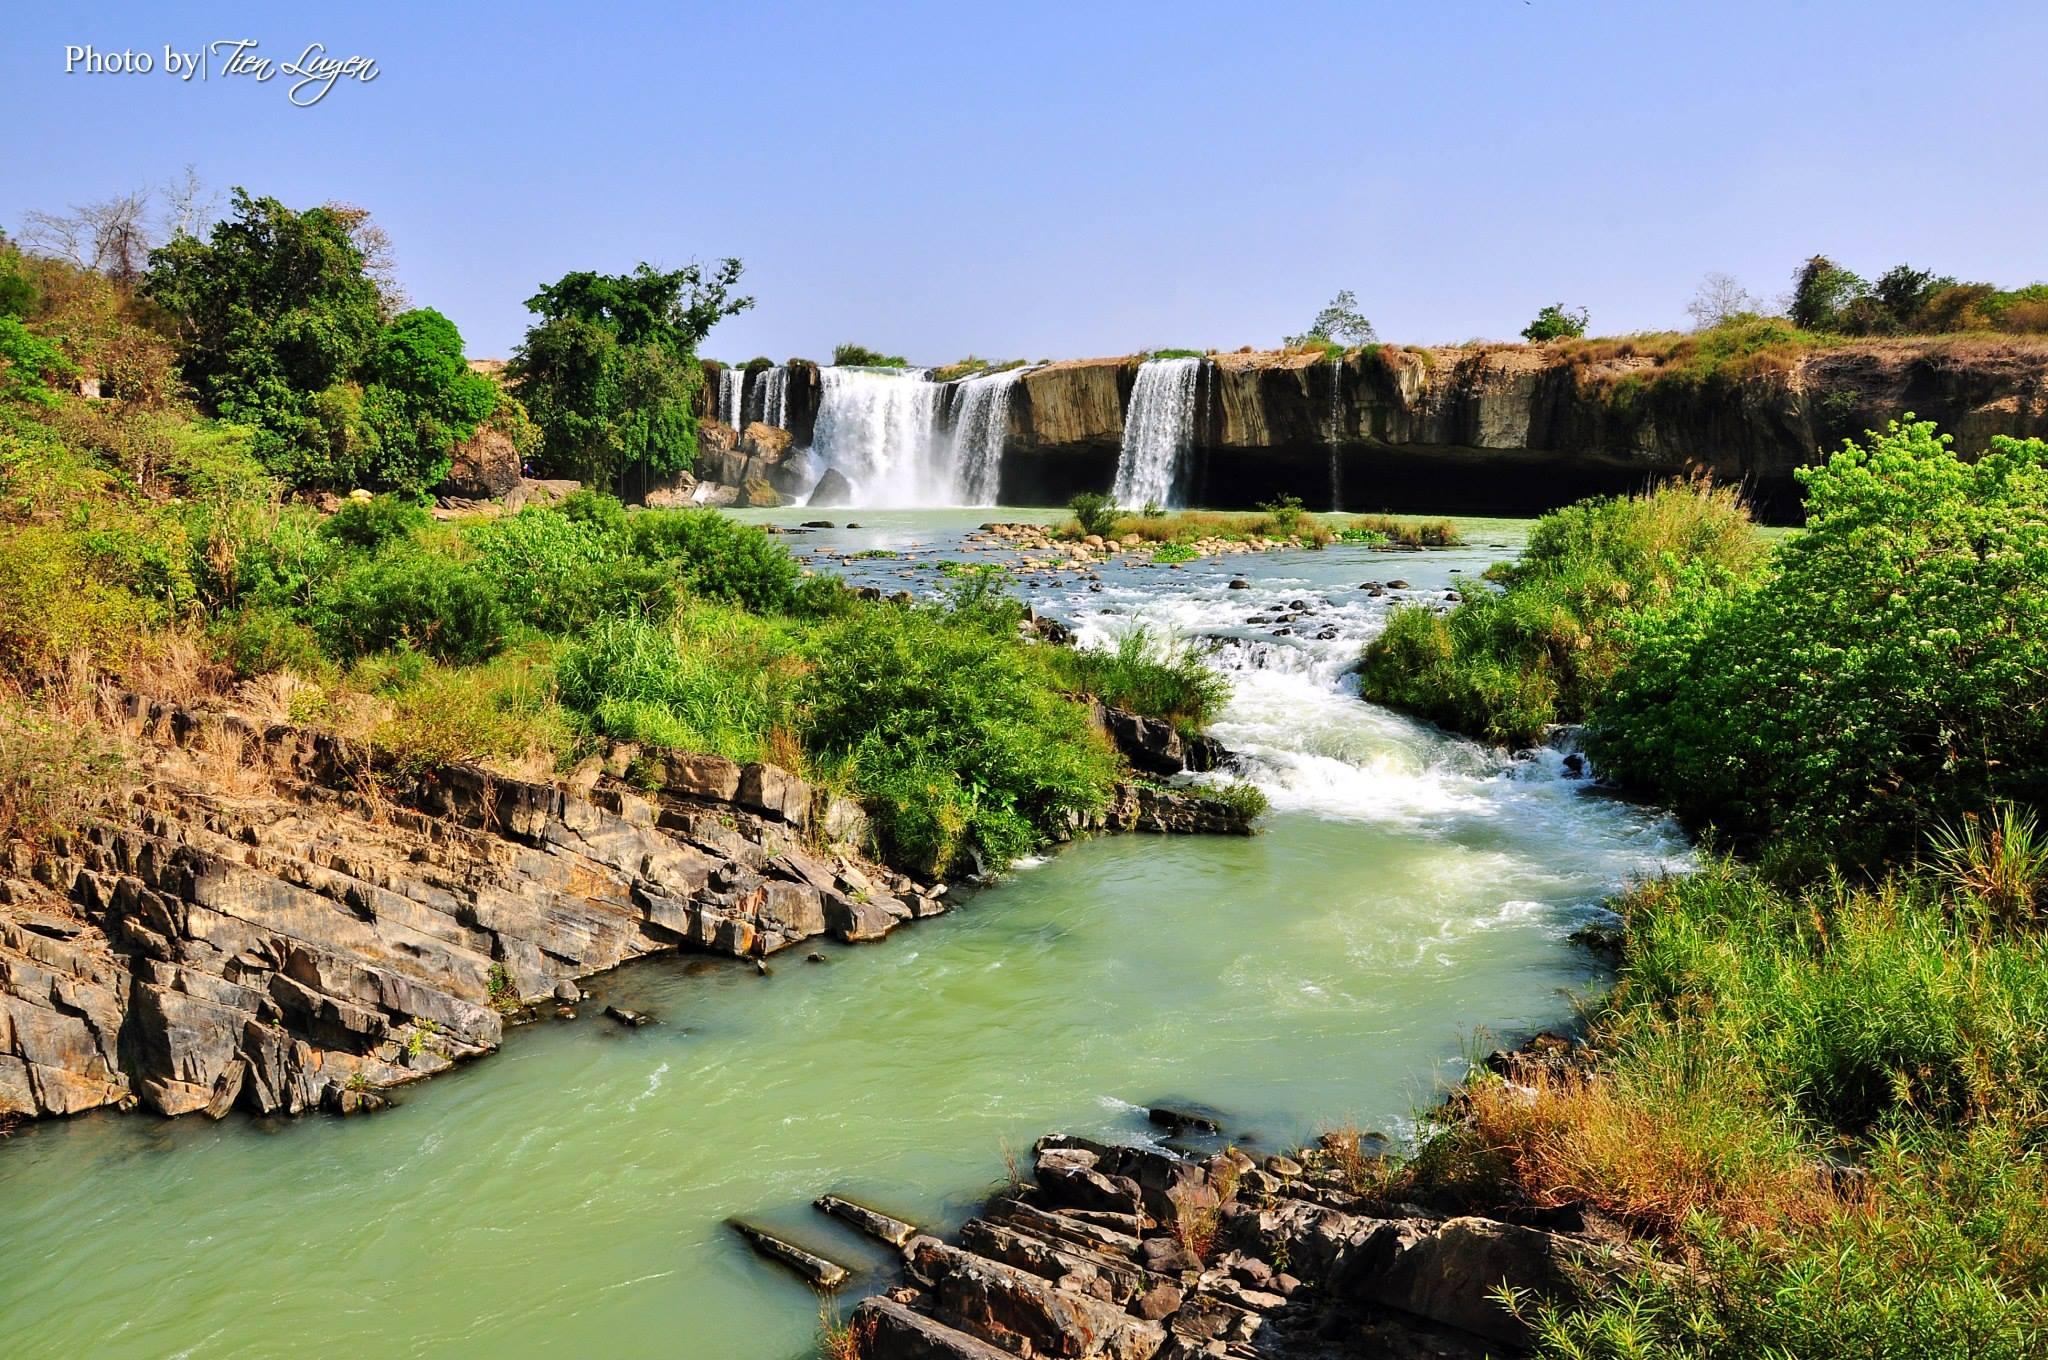 řeka lak